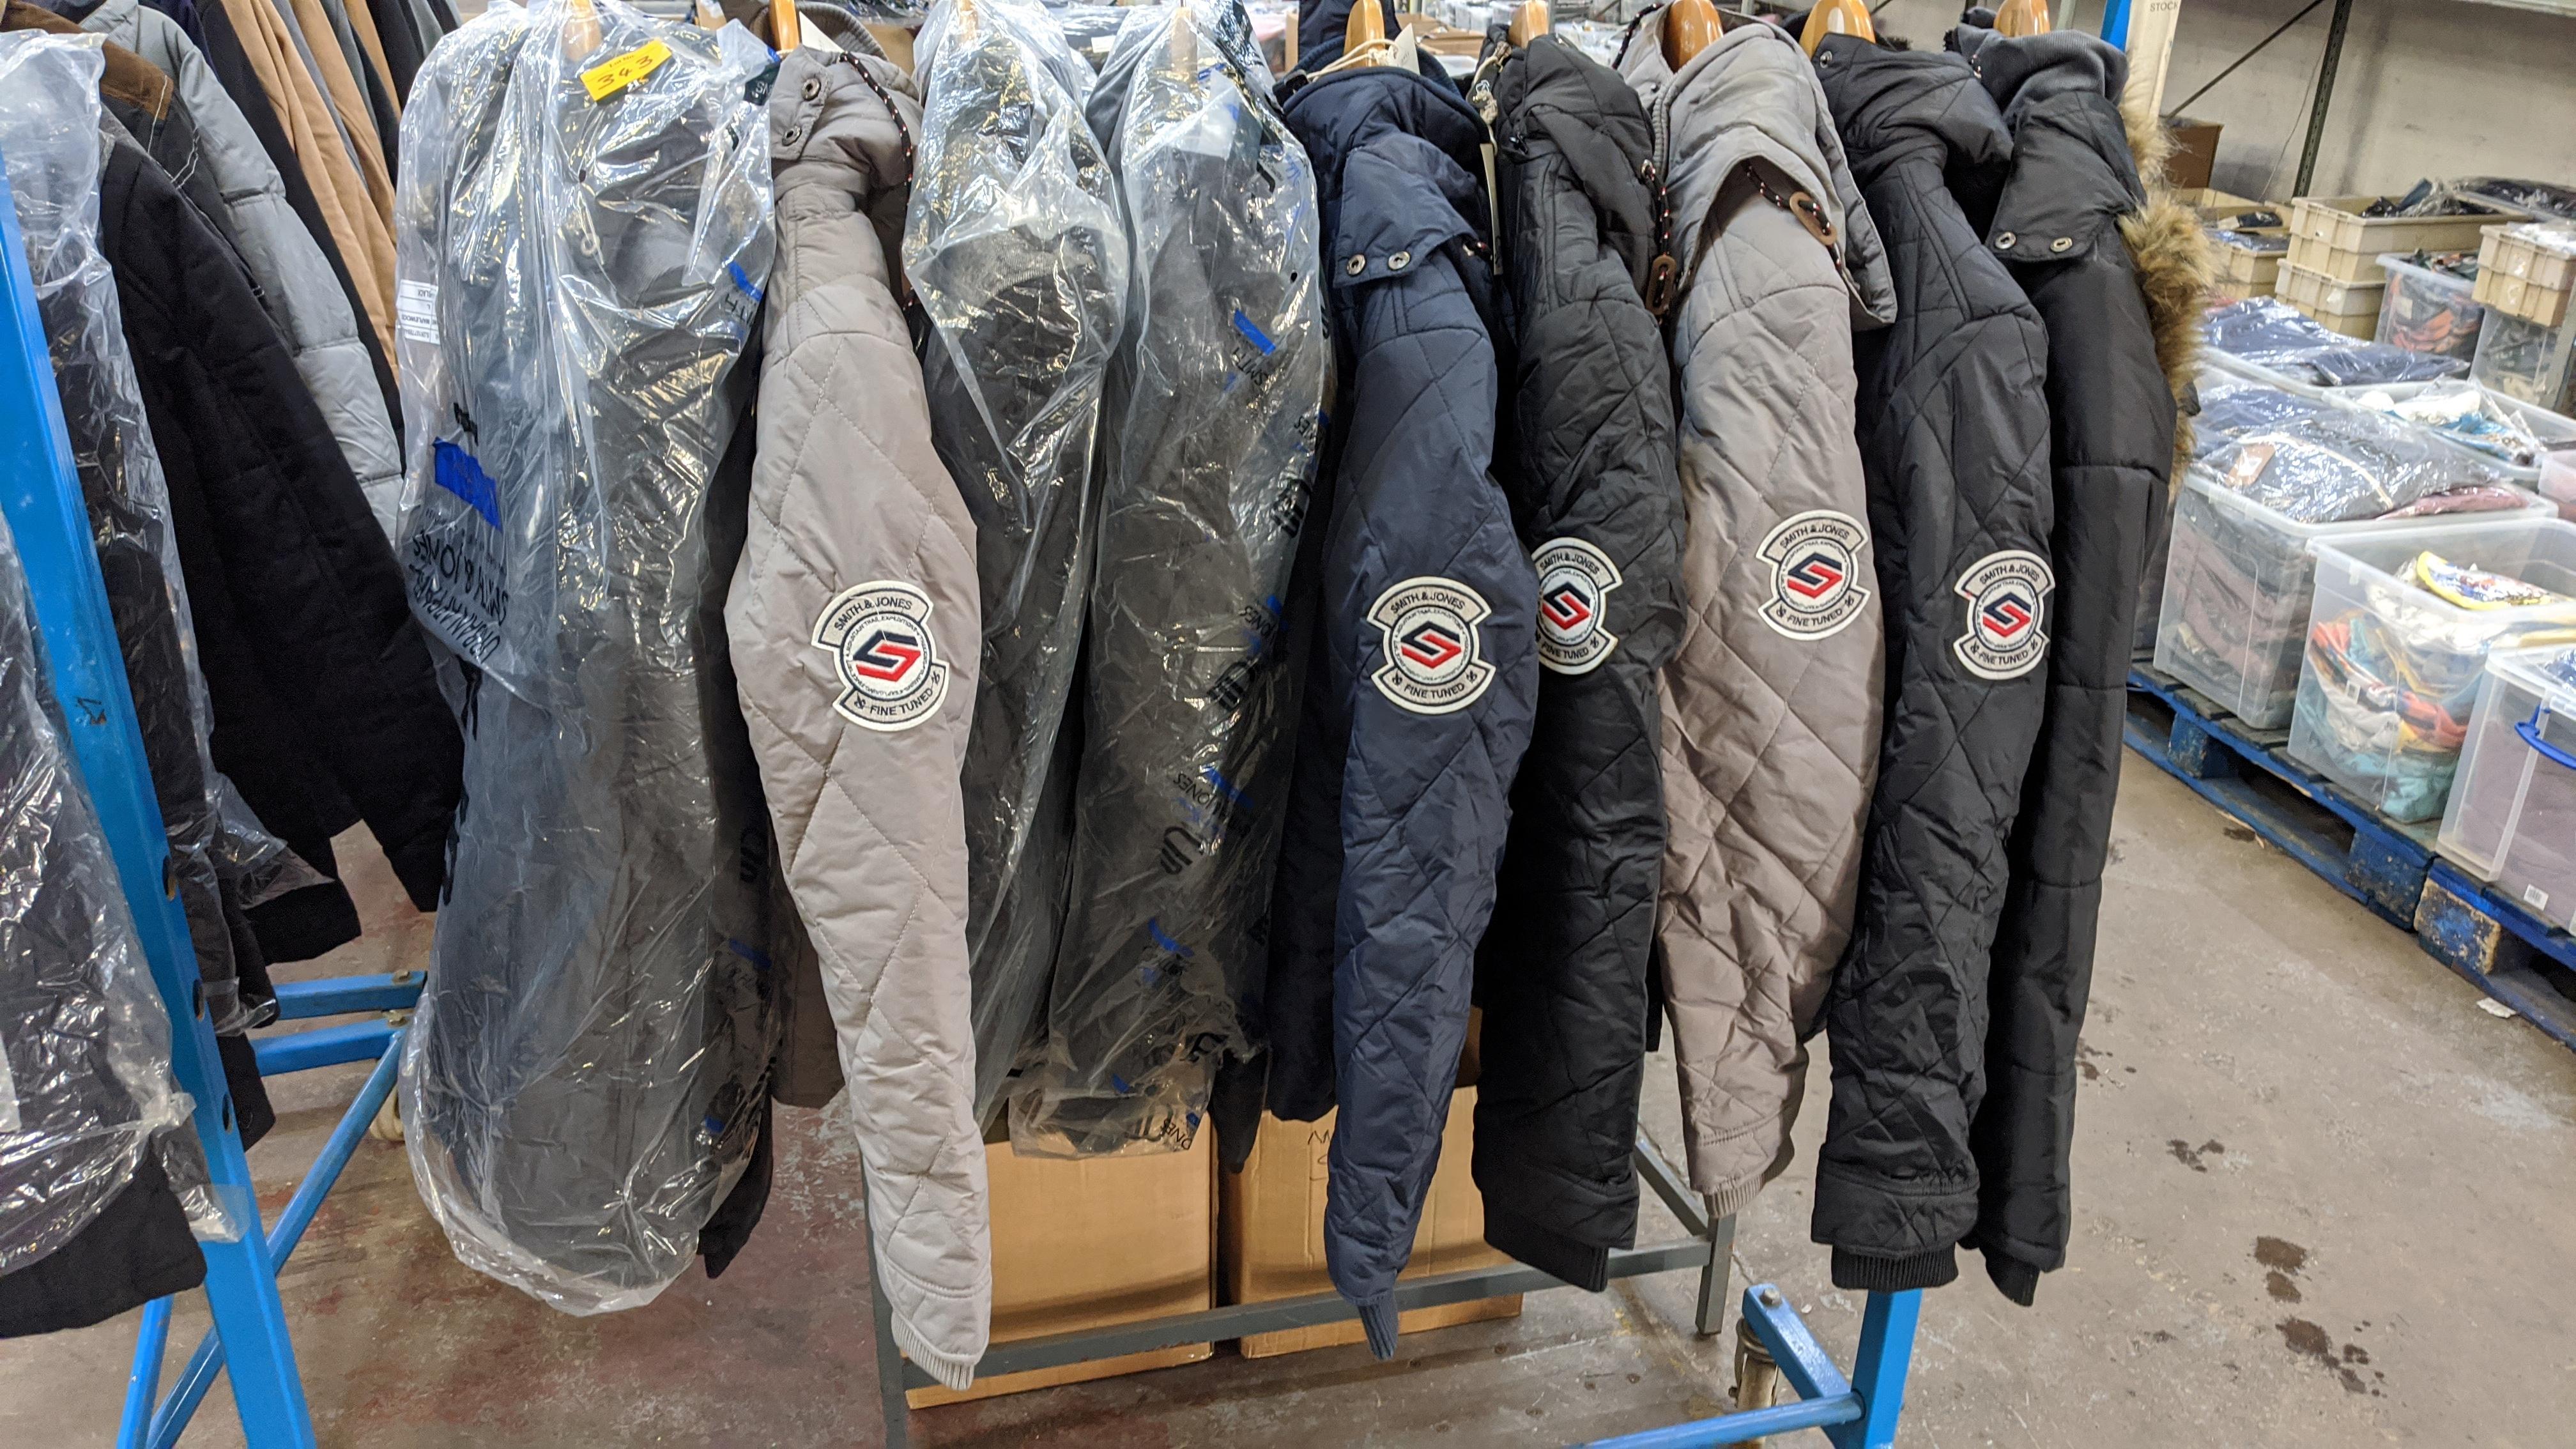 Very large quantity of primarily men's designer clothing & accessories. - Image 106 of 157